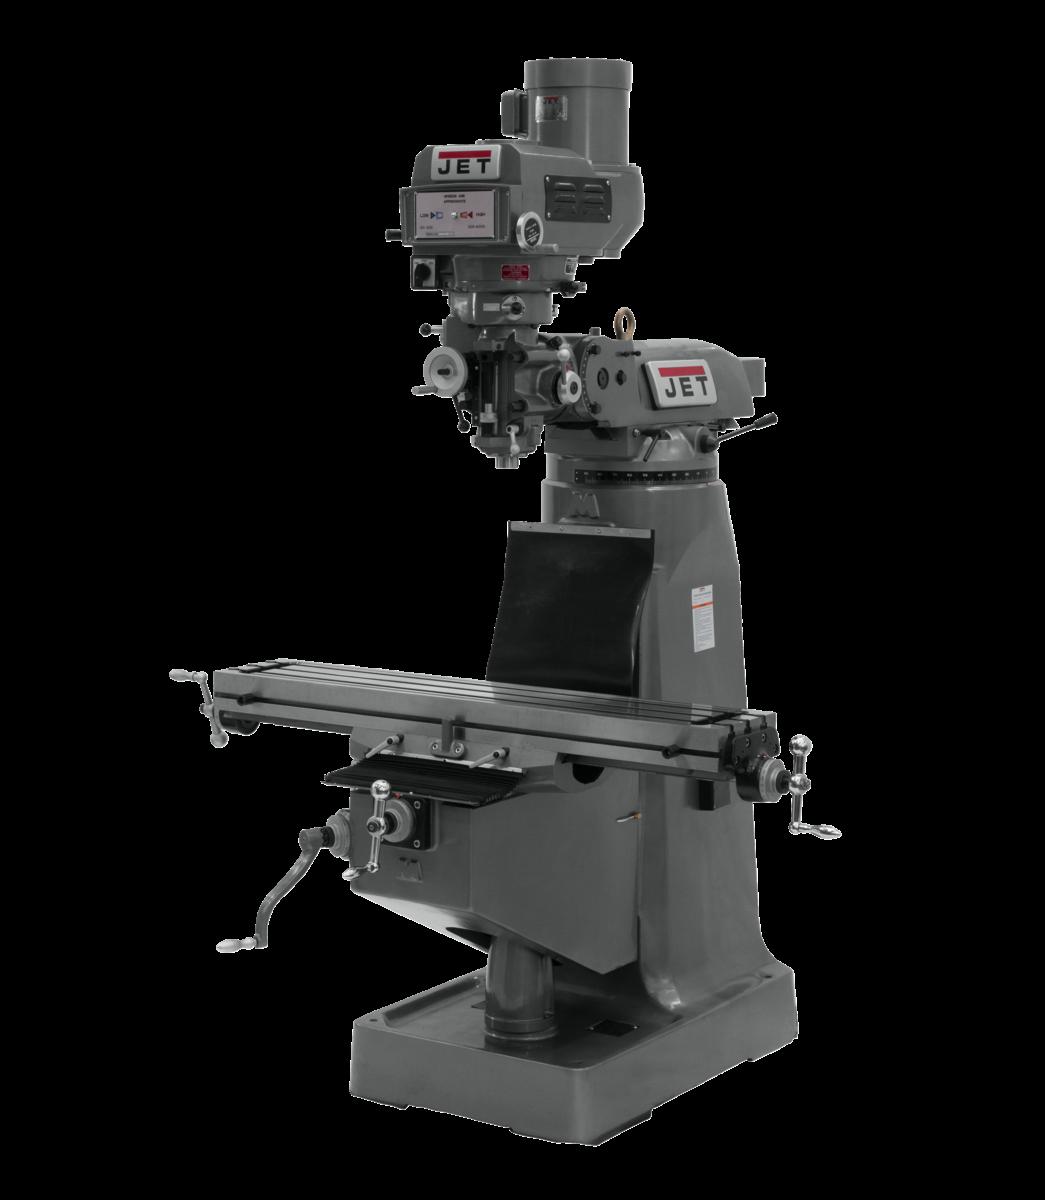 Fresadora JTM-4VS con visualizador de posición digital NEWALL DP700 instalado